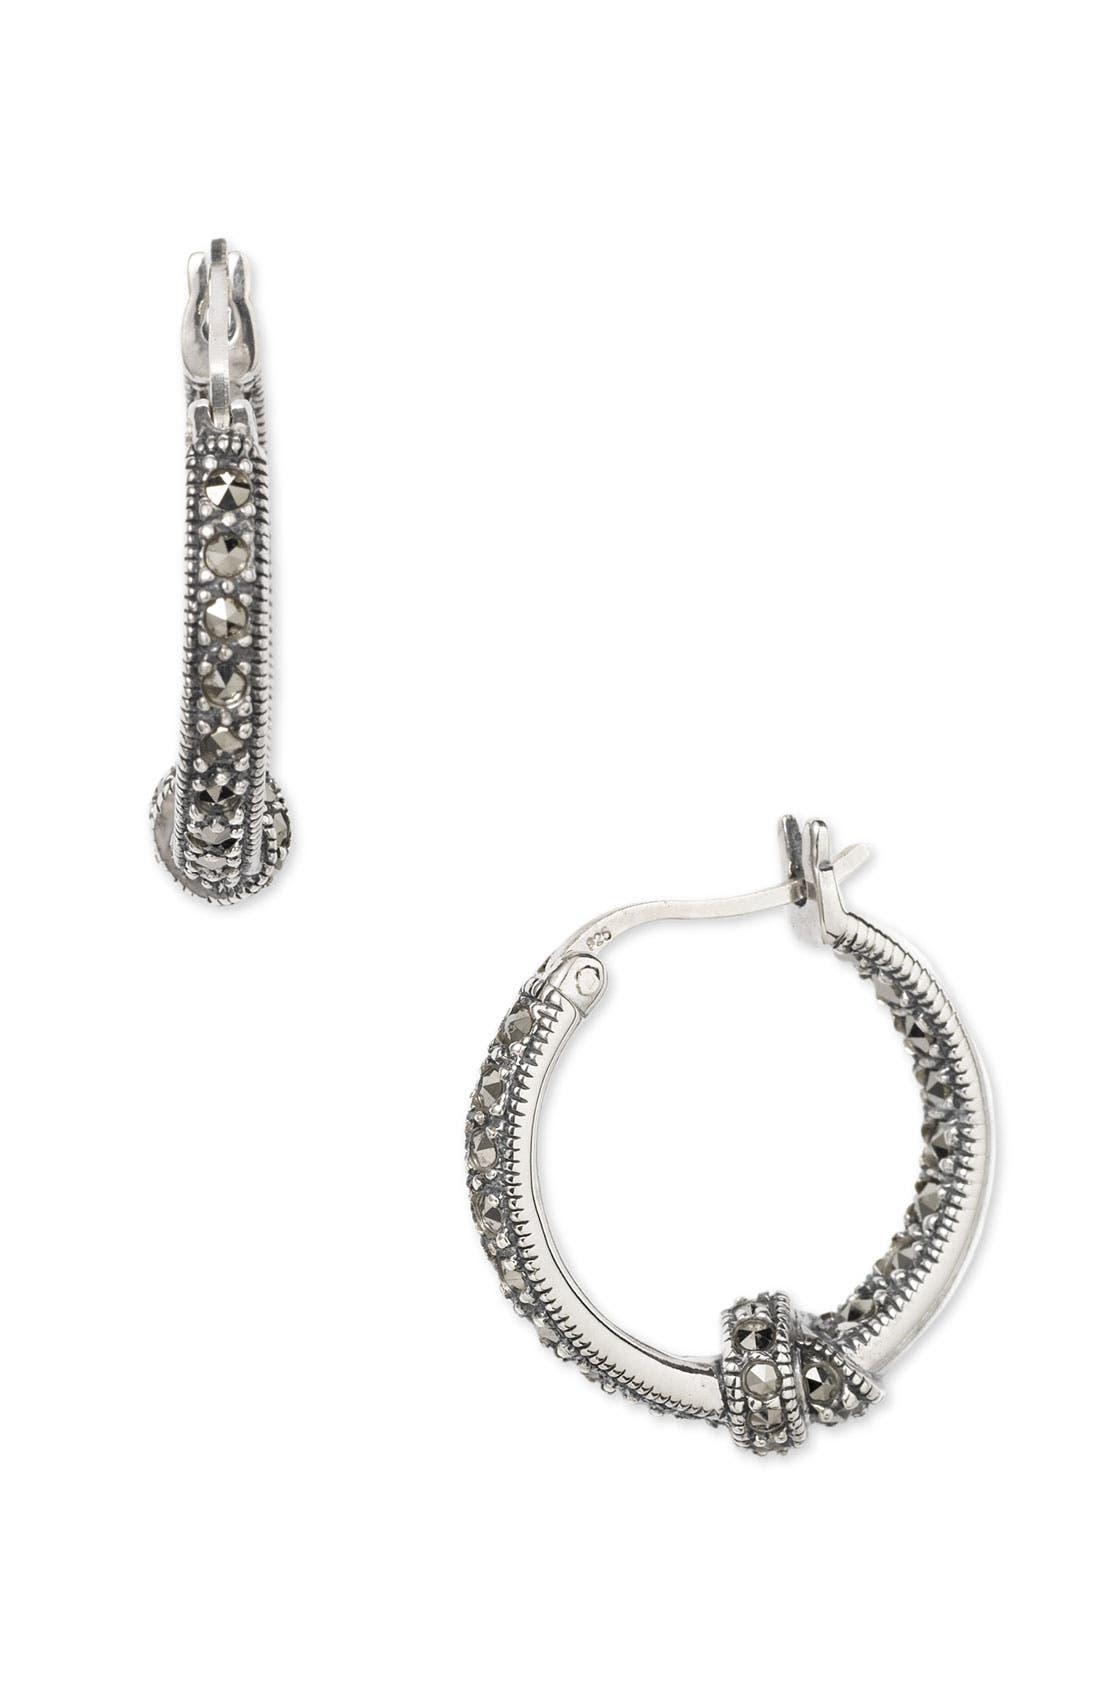 Main Image - Judith Jack Marcasite Hoop Earrings with Knot Detail